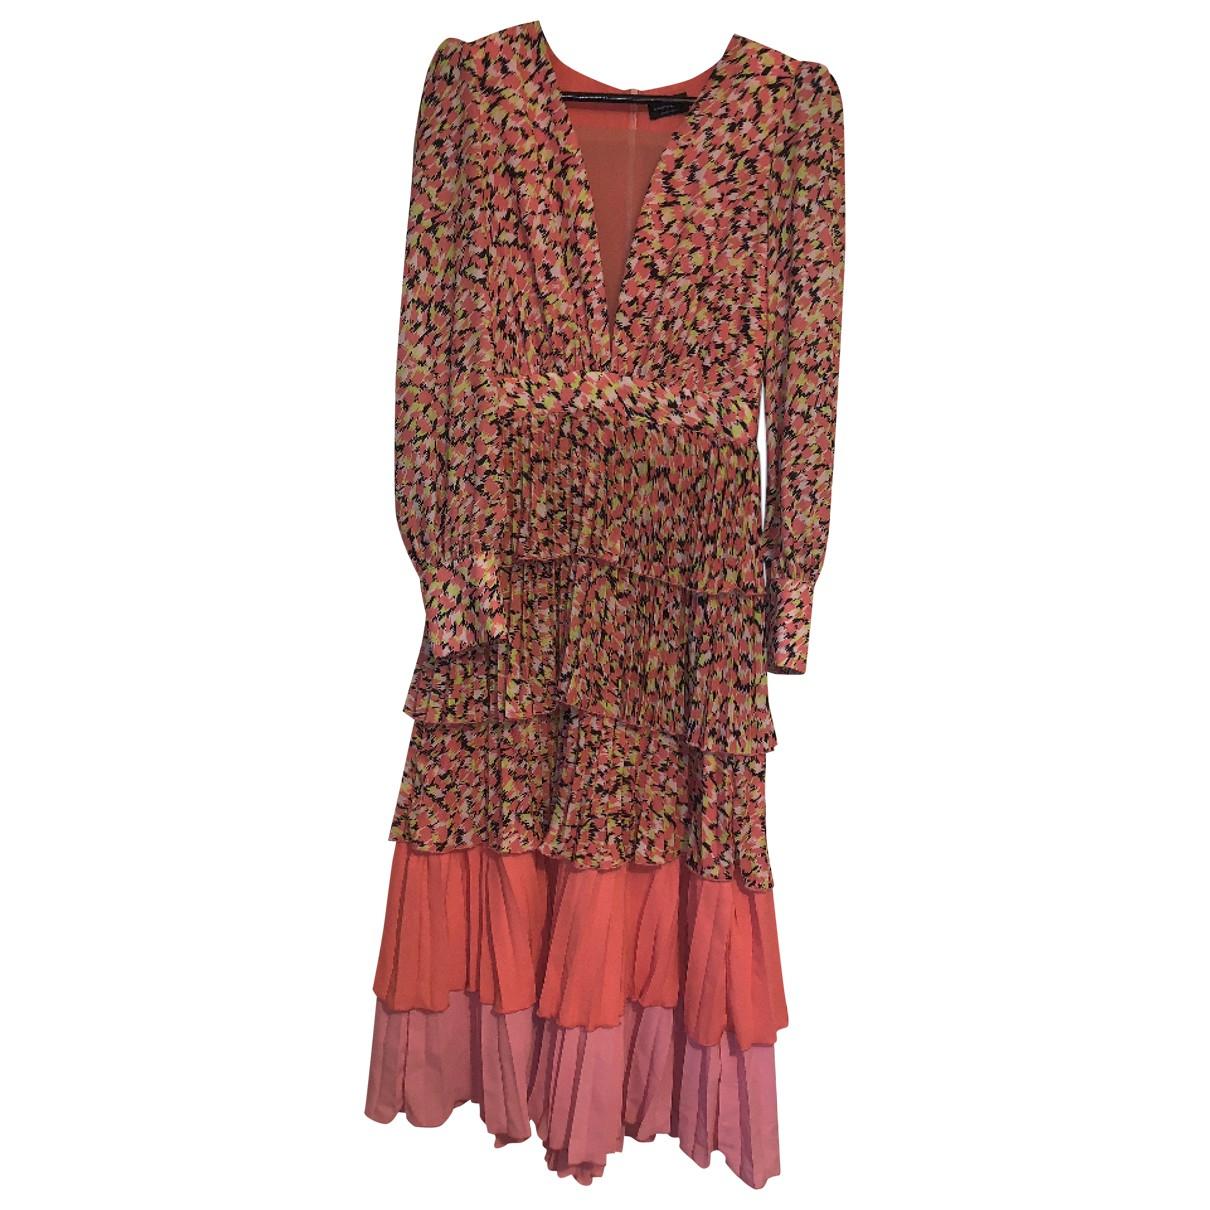 Elisabetta Franchi \N Multicolour dress for Women 42 IT